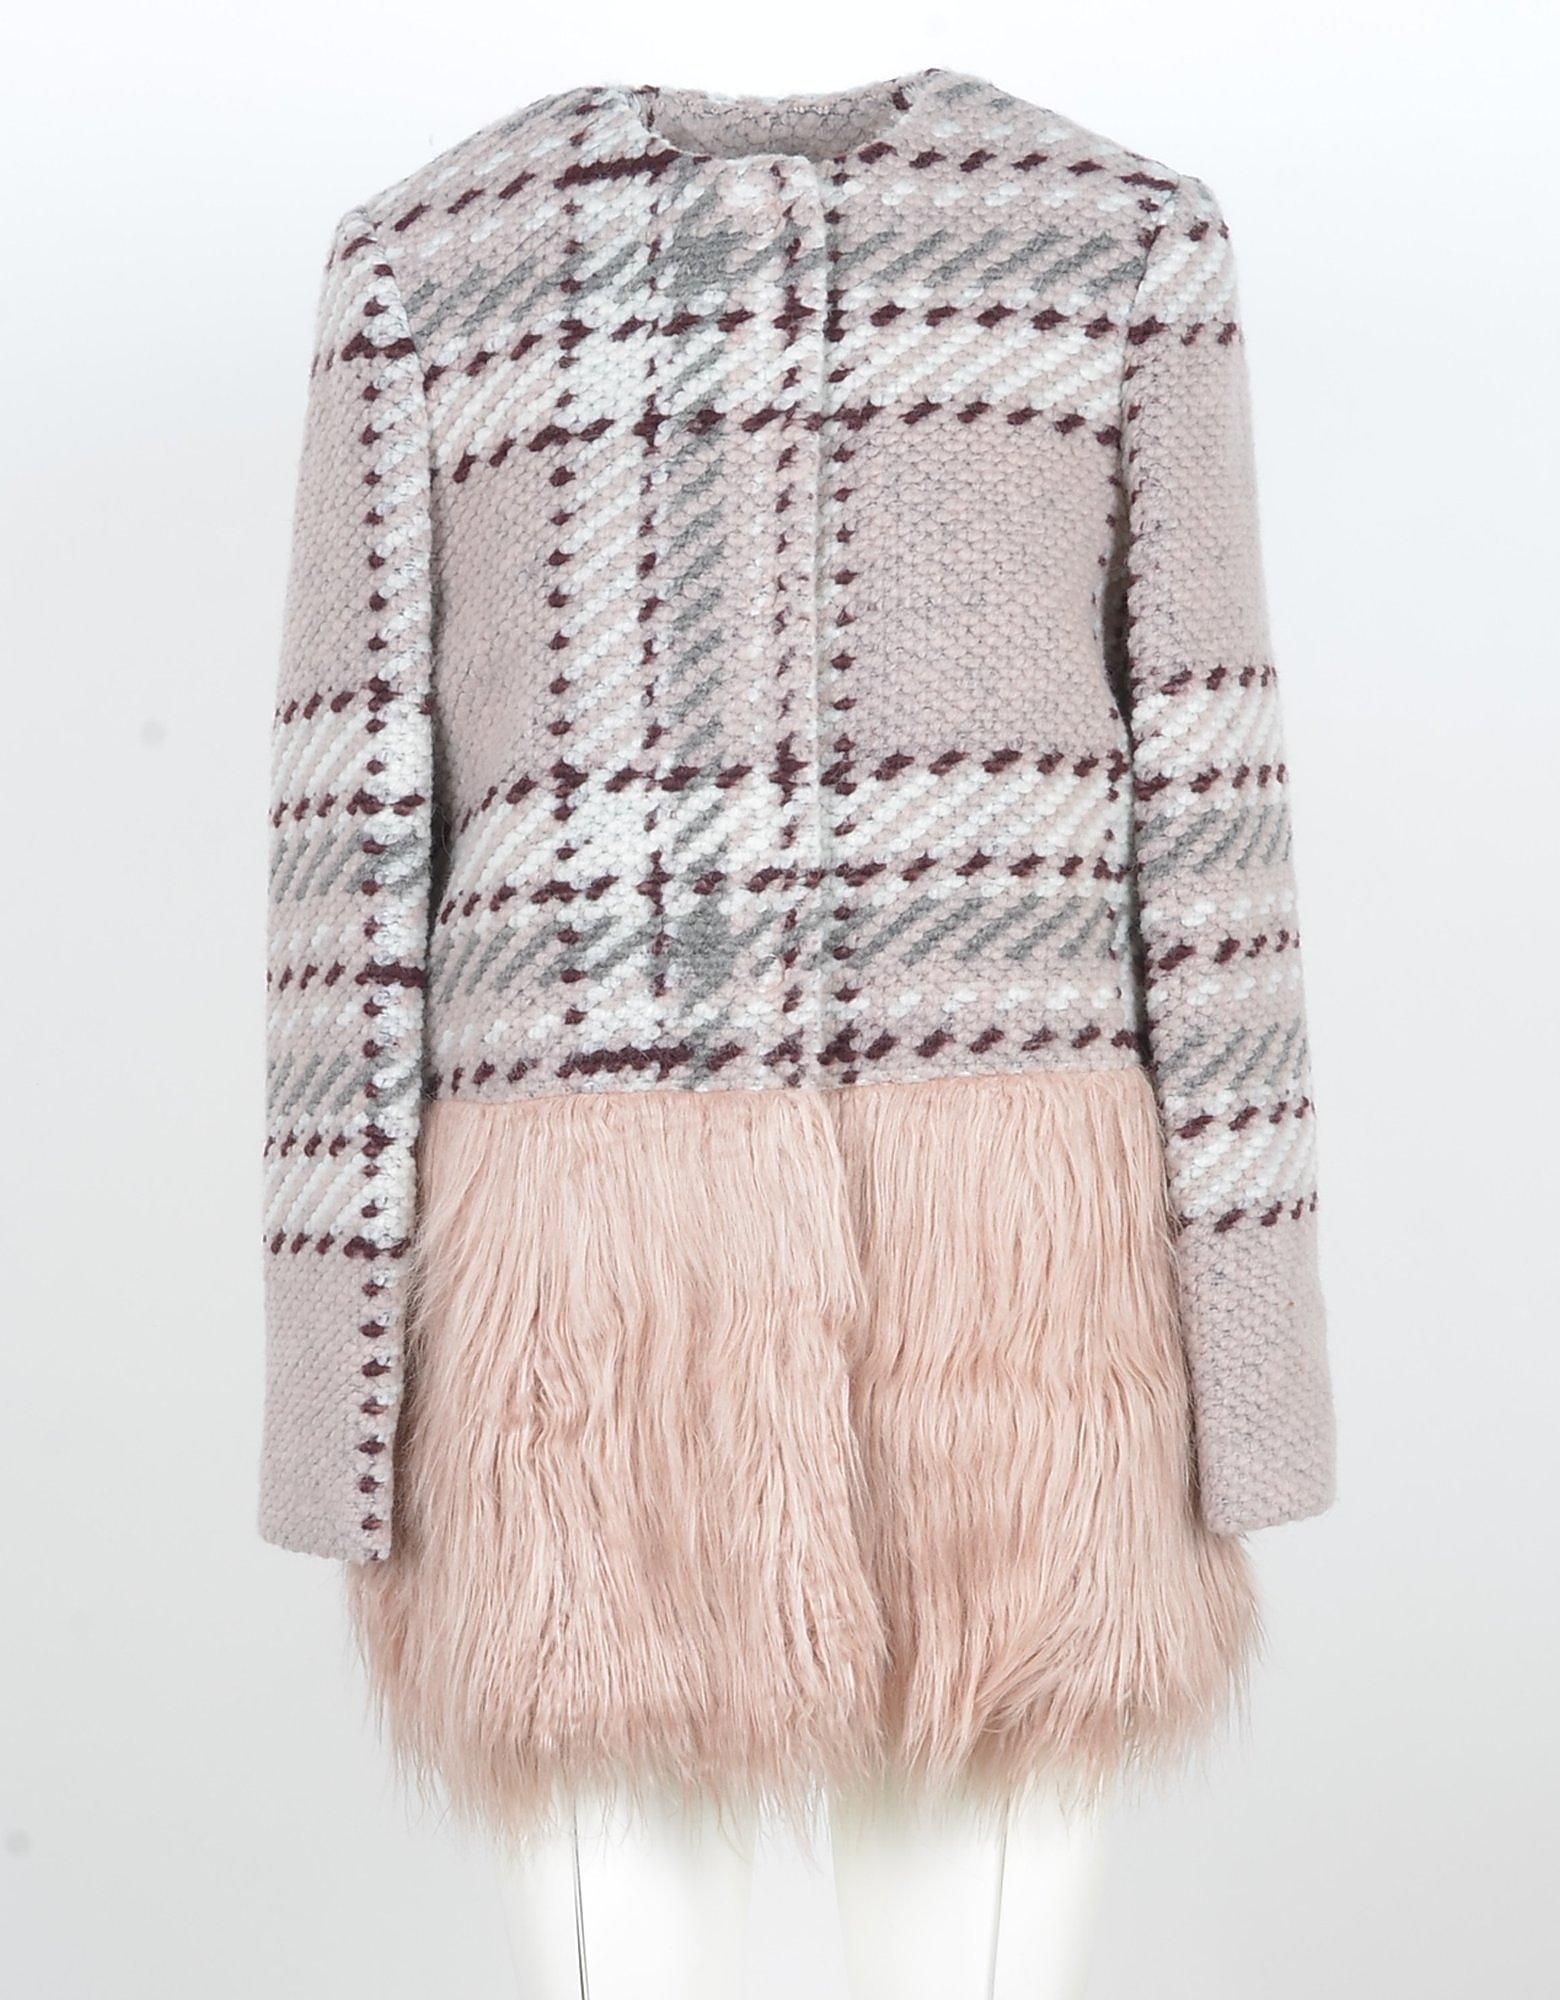 Blugirl Designer Coats & Jackets, Pink Wool Blend Women's Coat